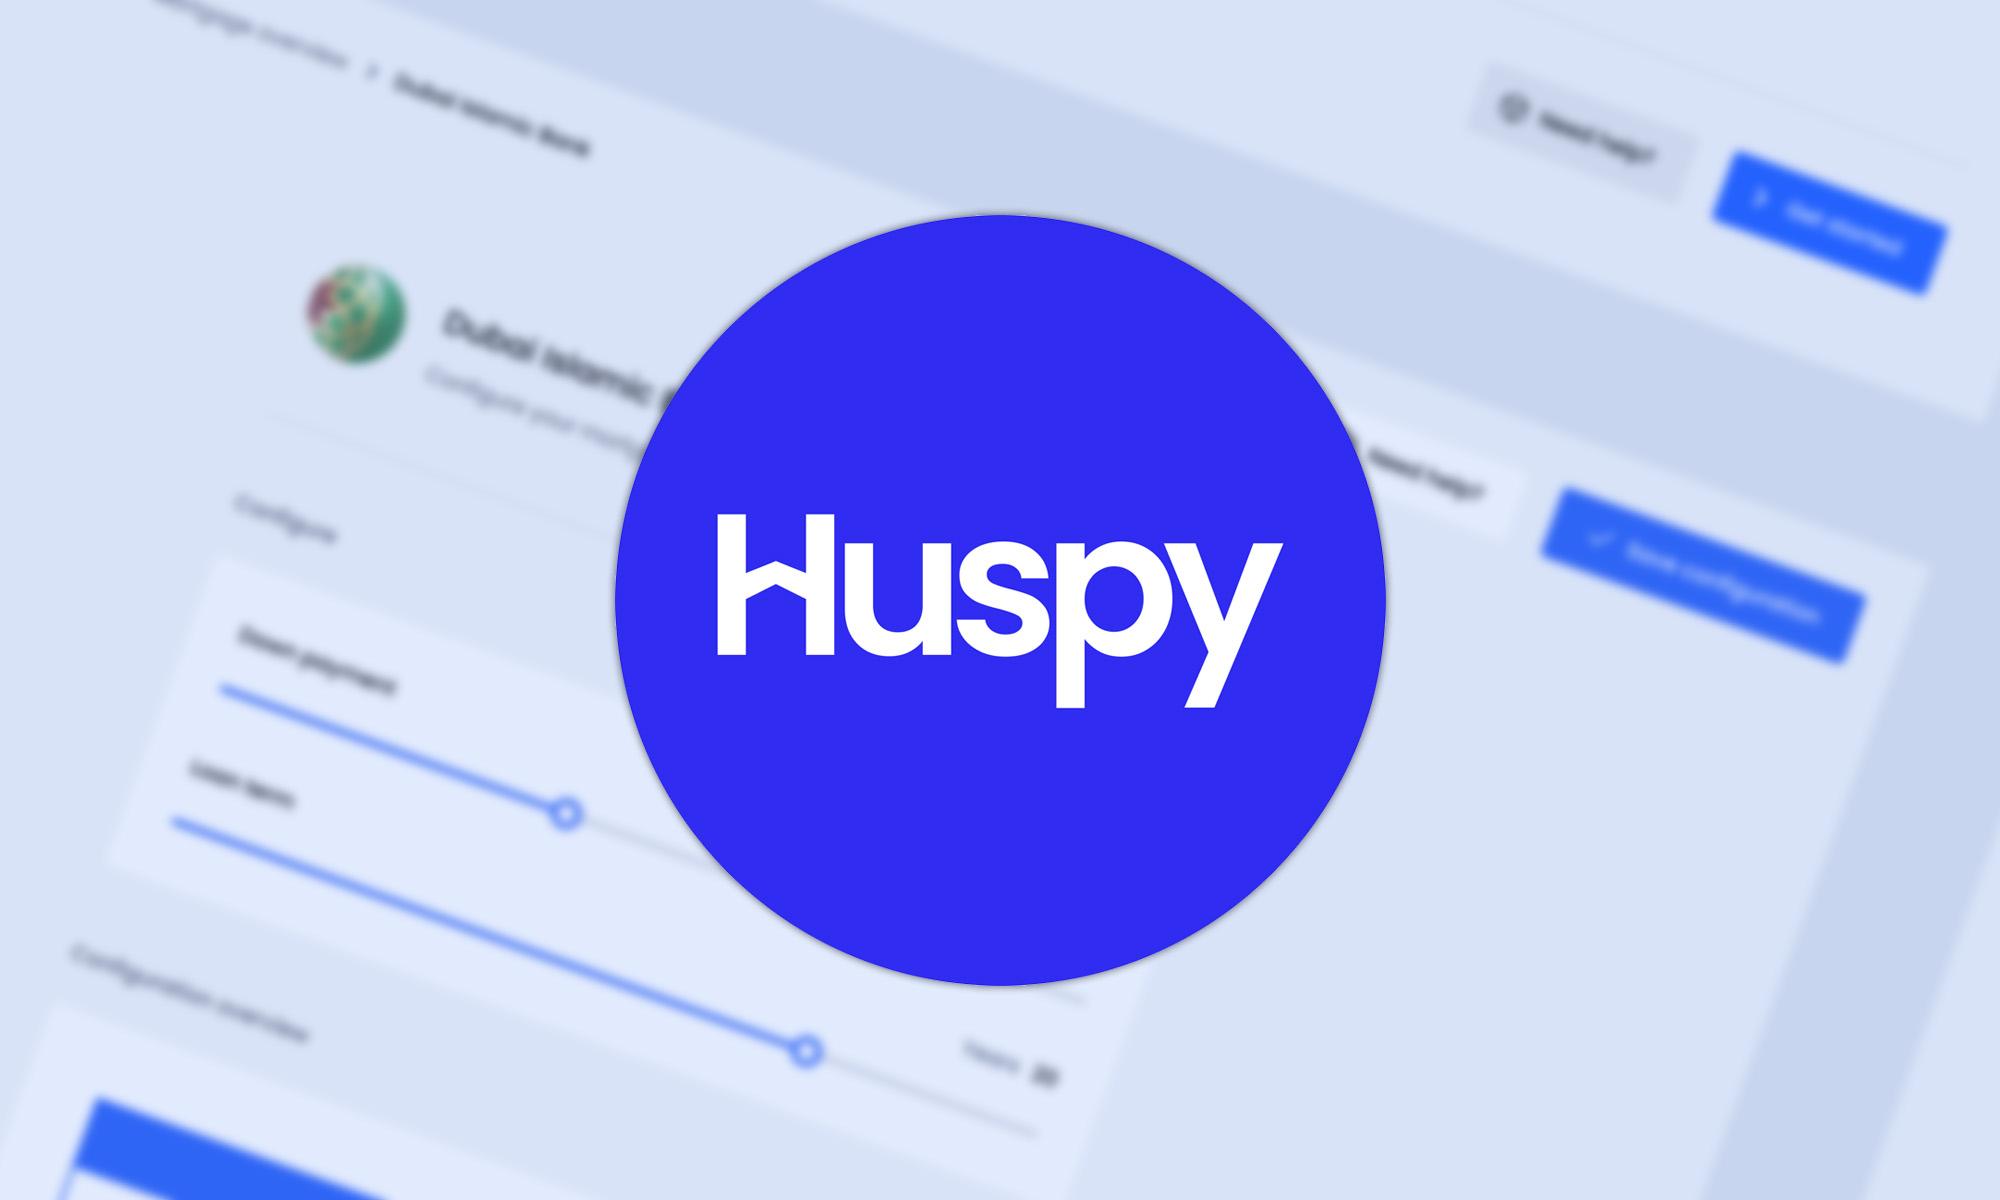 dubai-based startup huspy helps emiratis buy homes online